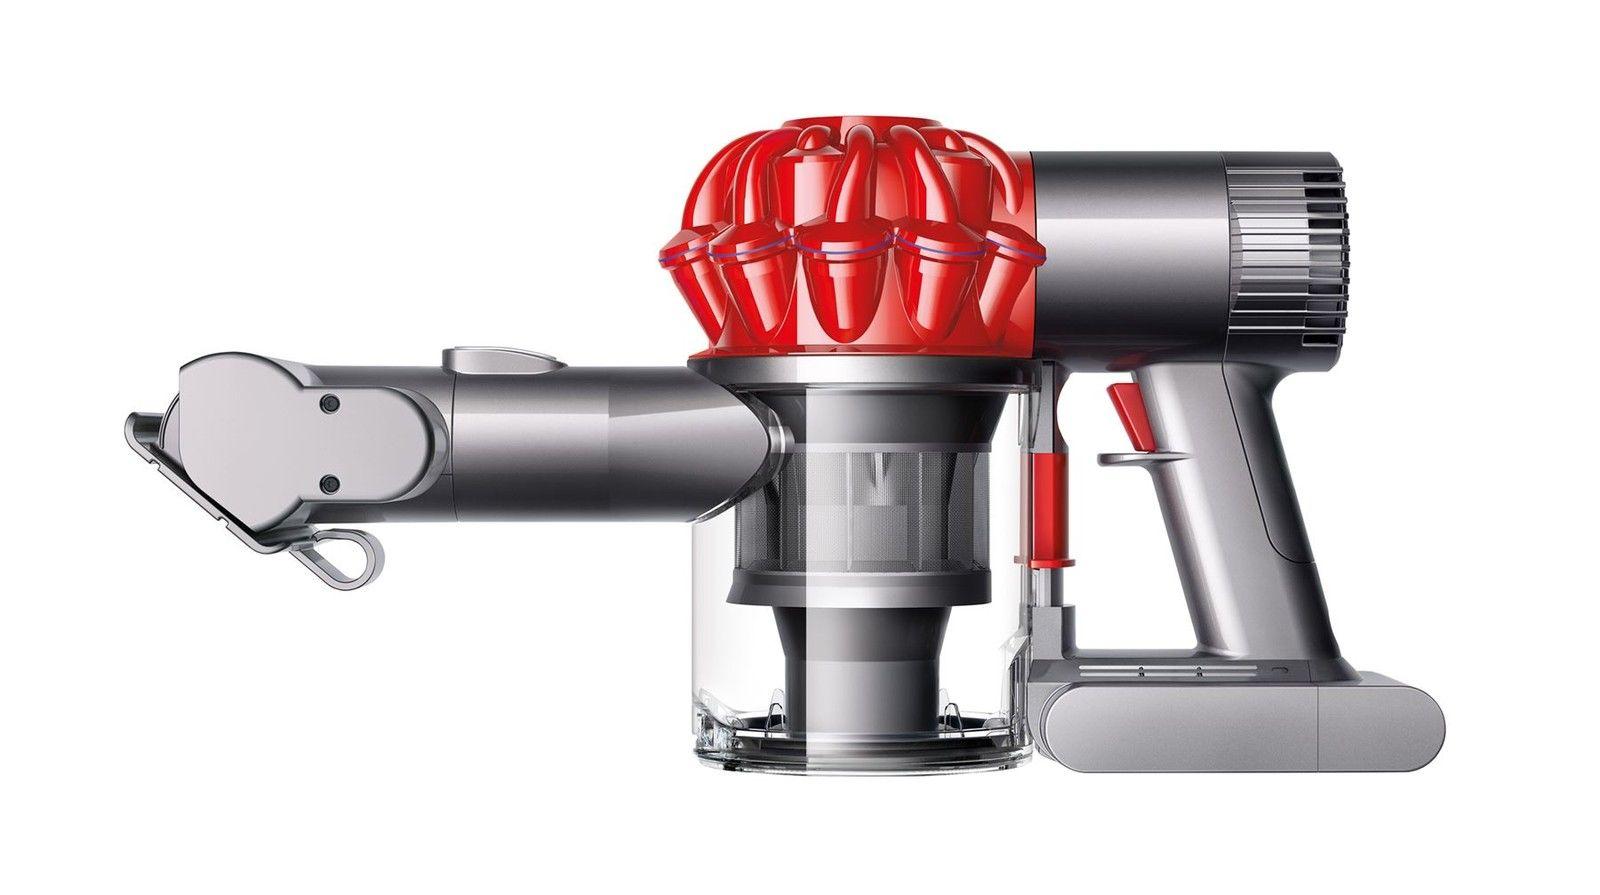 Dyson V6 Car + Boat Extra Handheld Vacuum Cleaner Refurb £99.99 - Dyson DC34 Refurb £79.99 - Dyson V6 Trigger Pro Refurb £109.99 - Dyson DC40 Multi Floor Refurb £119.99 - Dyson V6 Cord Free £129.99 @ Dyson eBay